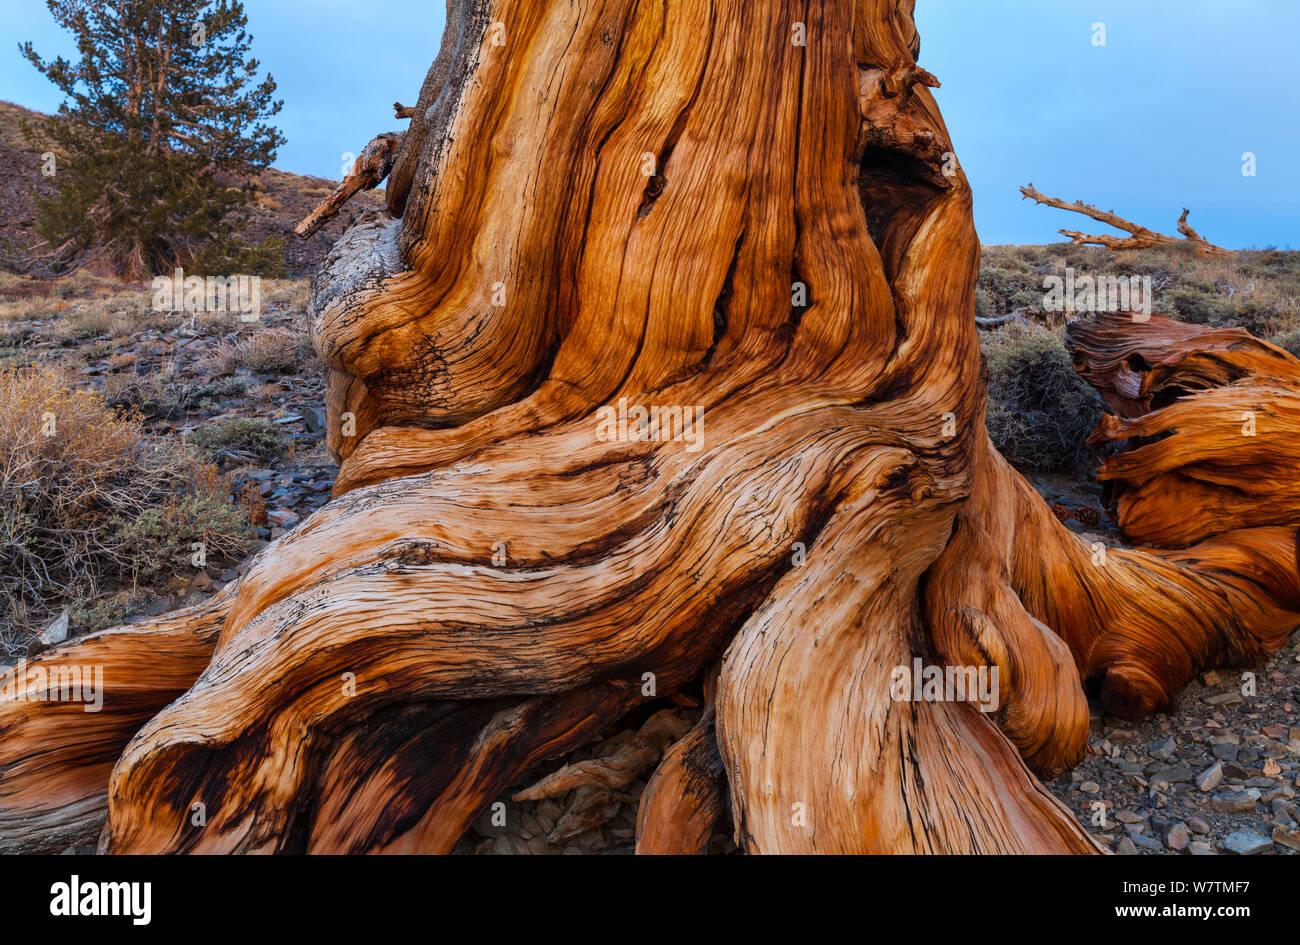 Great Basin Bristlecone Pine (Pinus longaeva) raíces del árbol antiguo, Inyo National Forest, White Mountains, California, EE.UU., marzo. Foto de stock